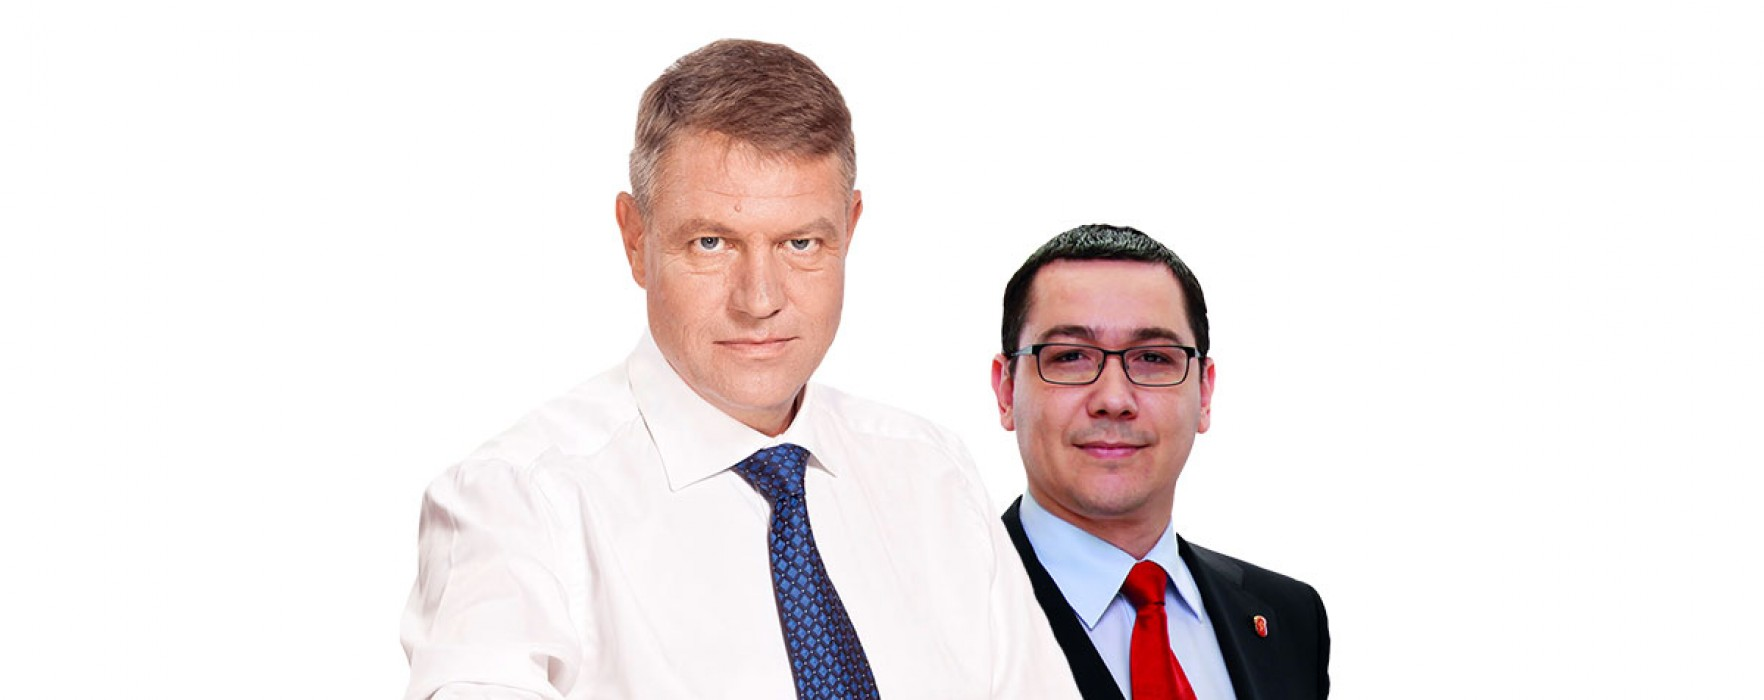 Exit-poll IRES: Klaus Iohannis 50,9 %, Victor Ponta 49,1 %